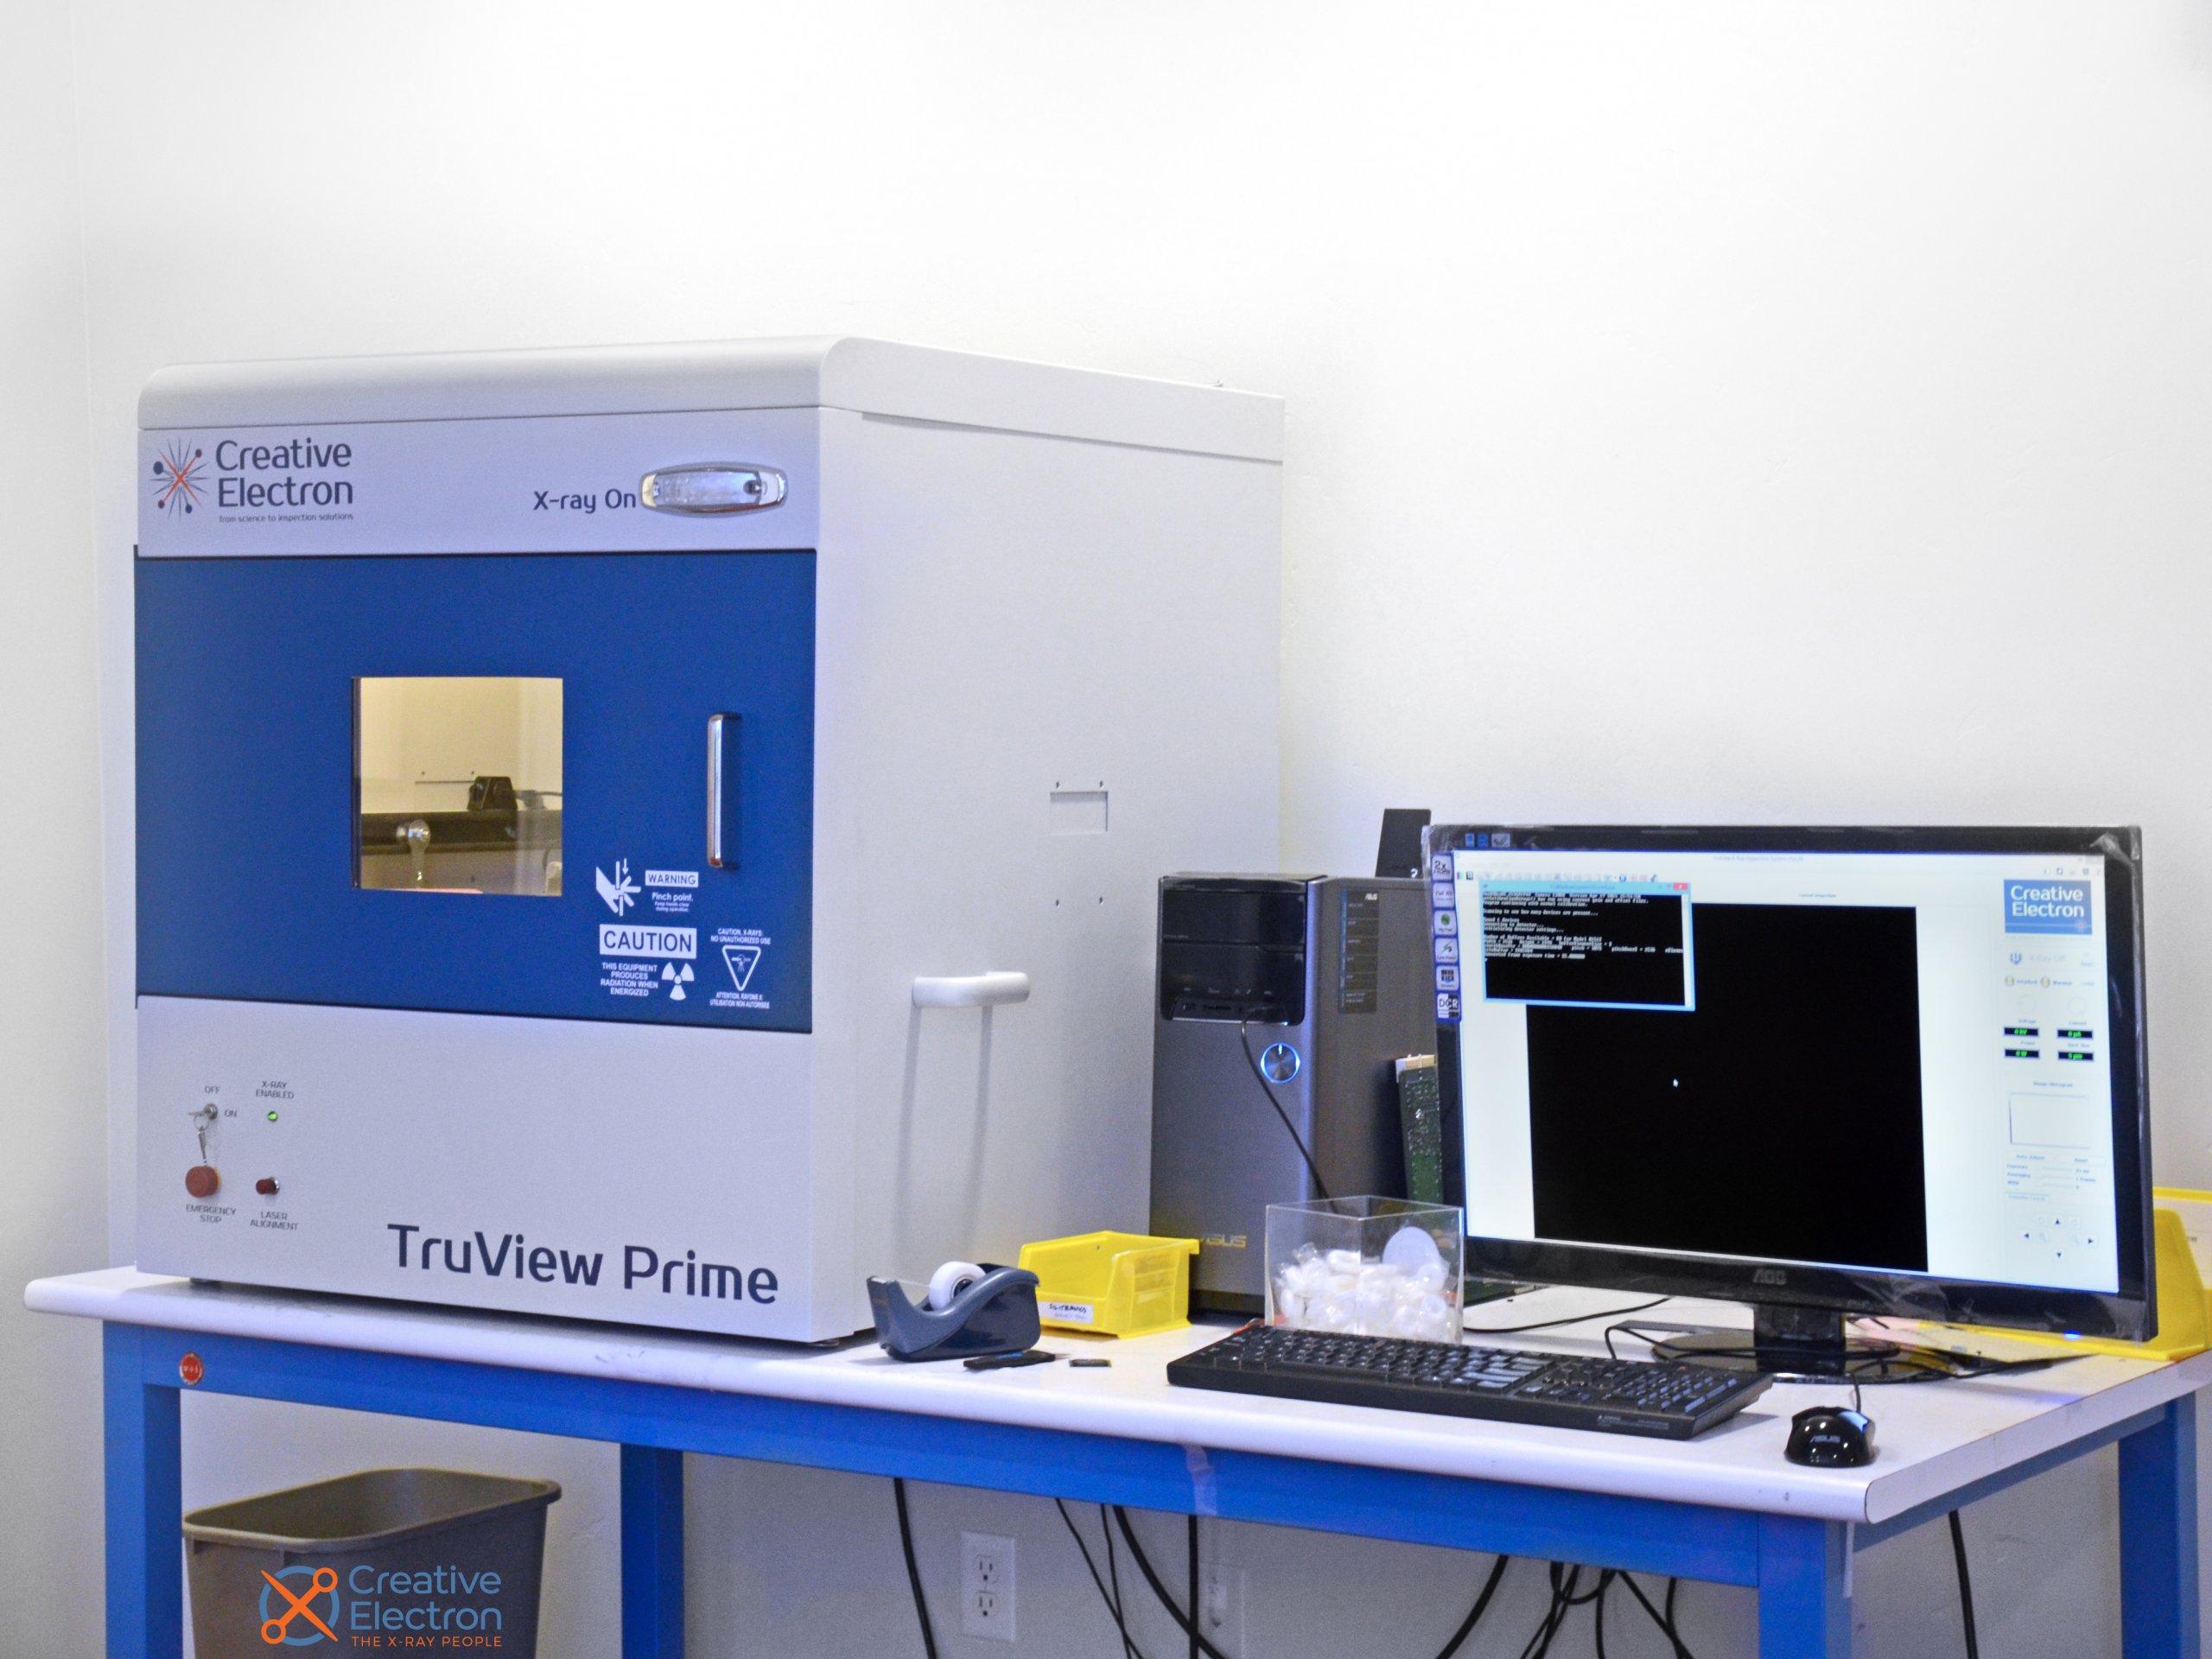 X-ray machines and monitors at Creative Electron.